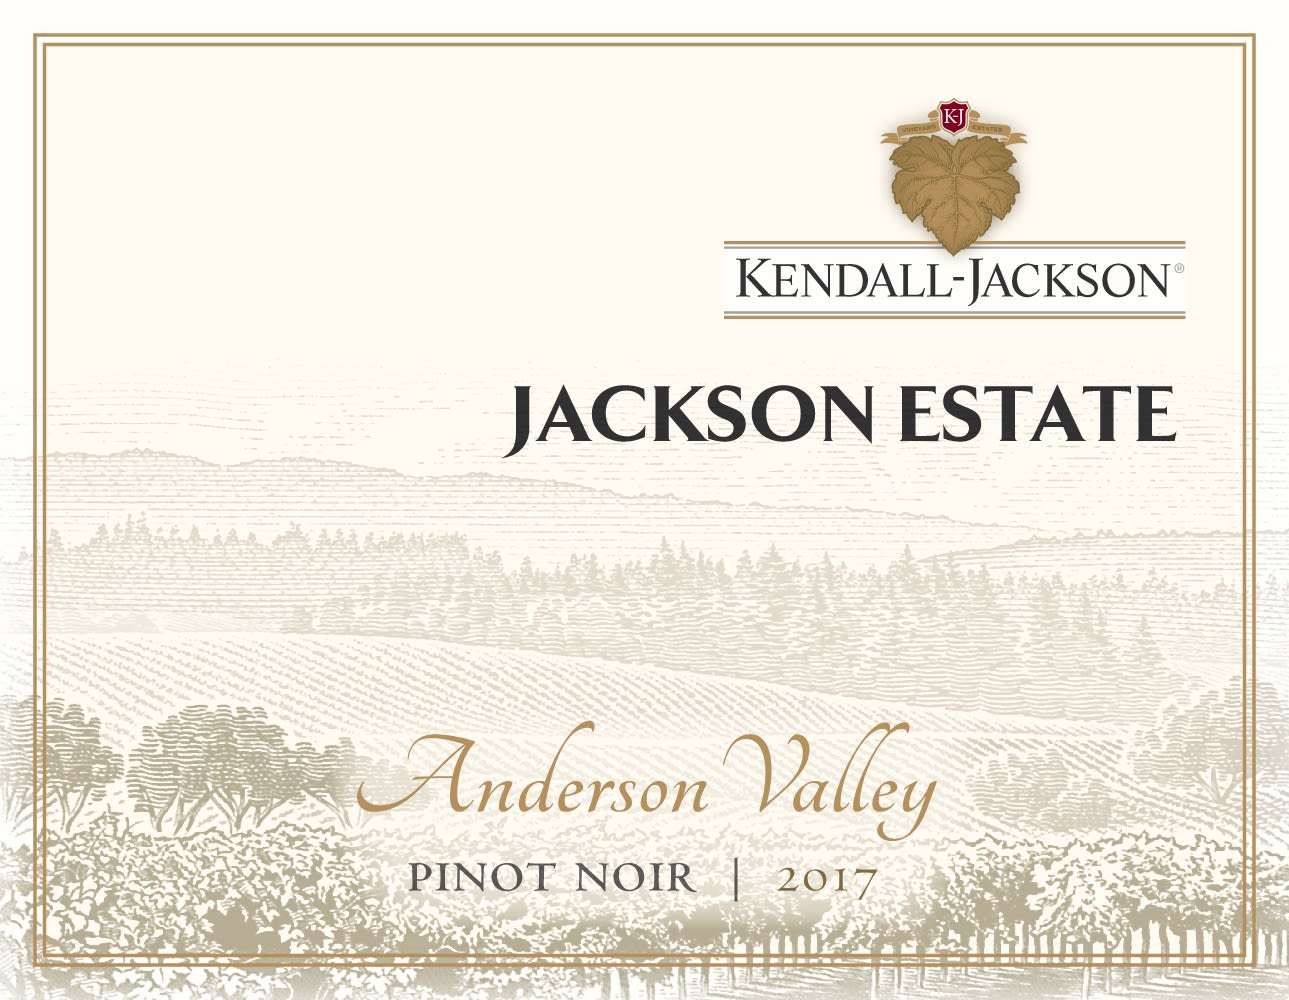 Kendall-Jackson Jackson Estate Anderson Valley Pinot Noir 2017